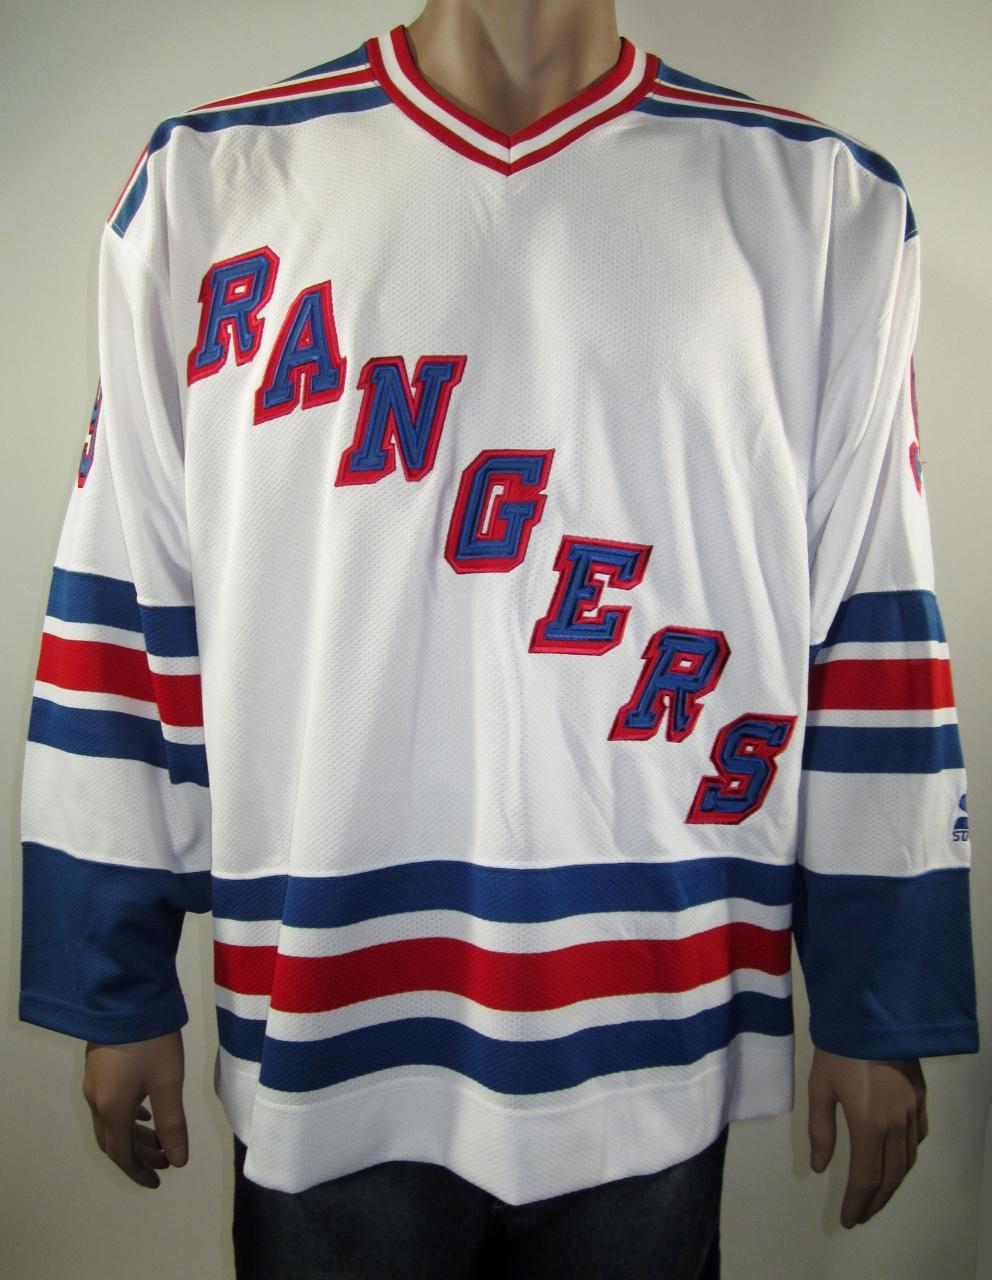 ae24a239bdb Wayne Gretzky New York Rangers Starter Hockey Jersey XL NWT ...